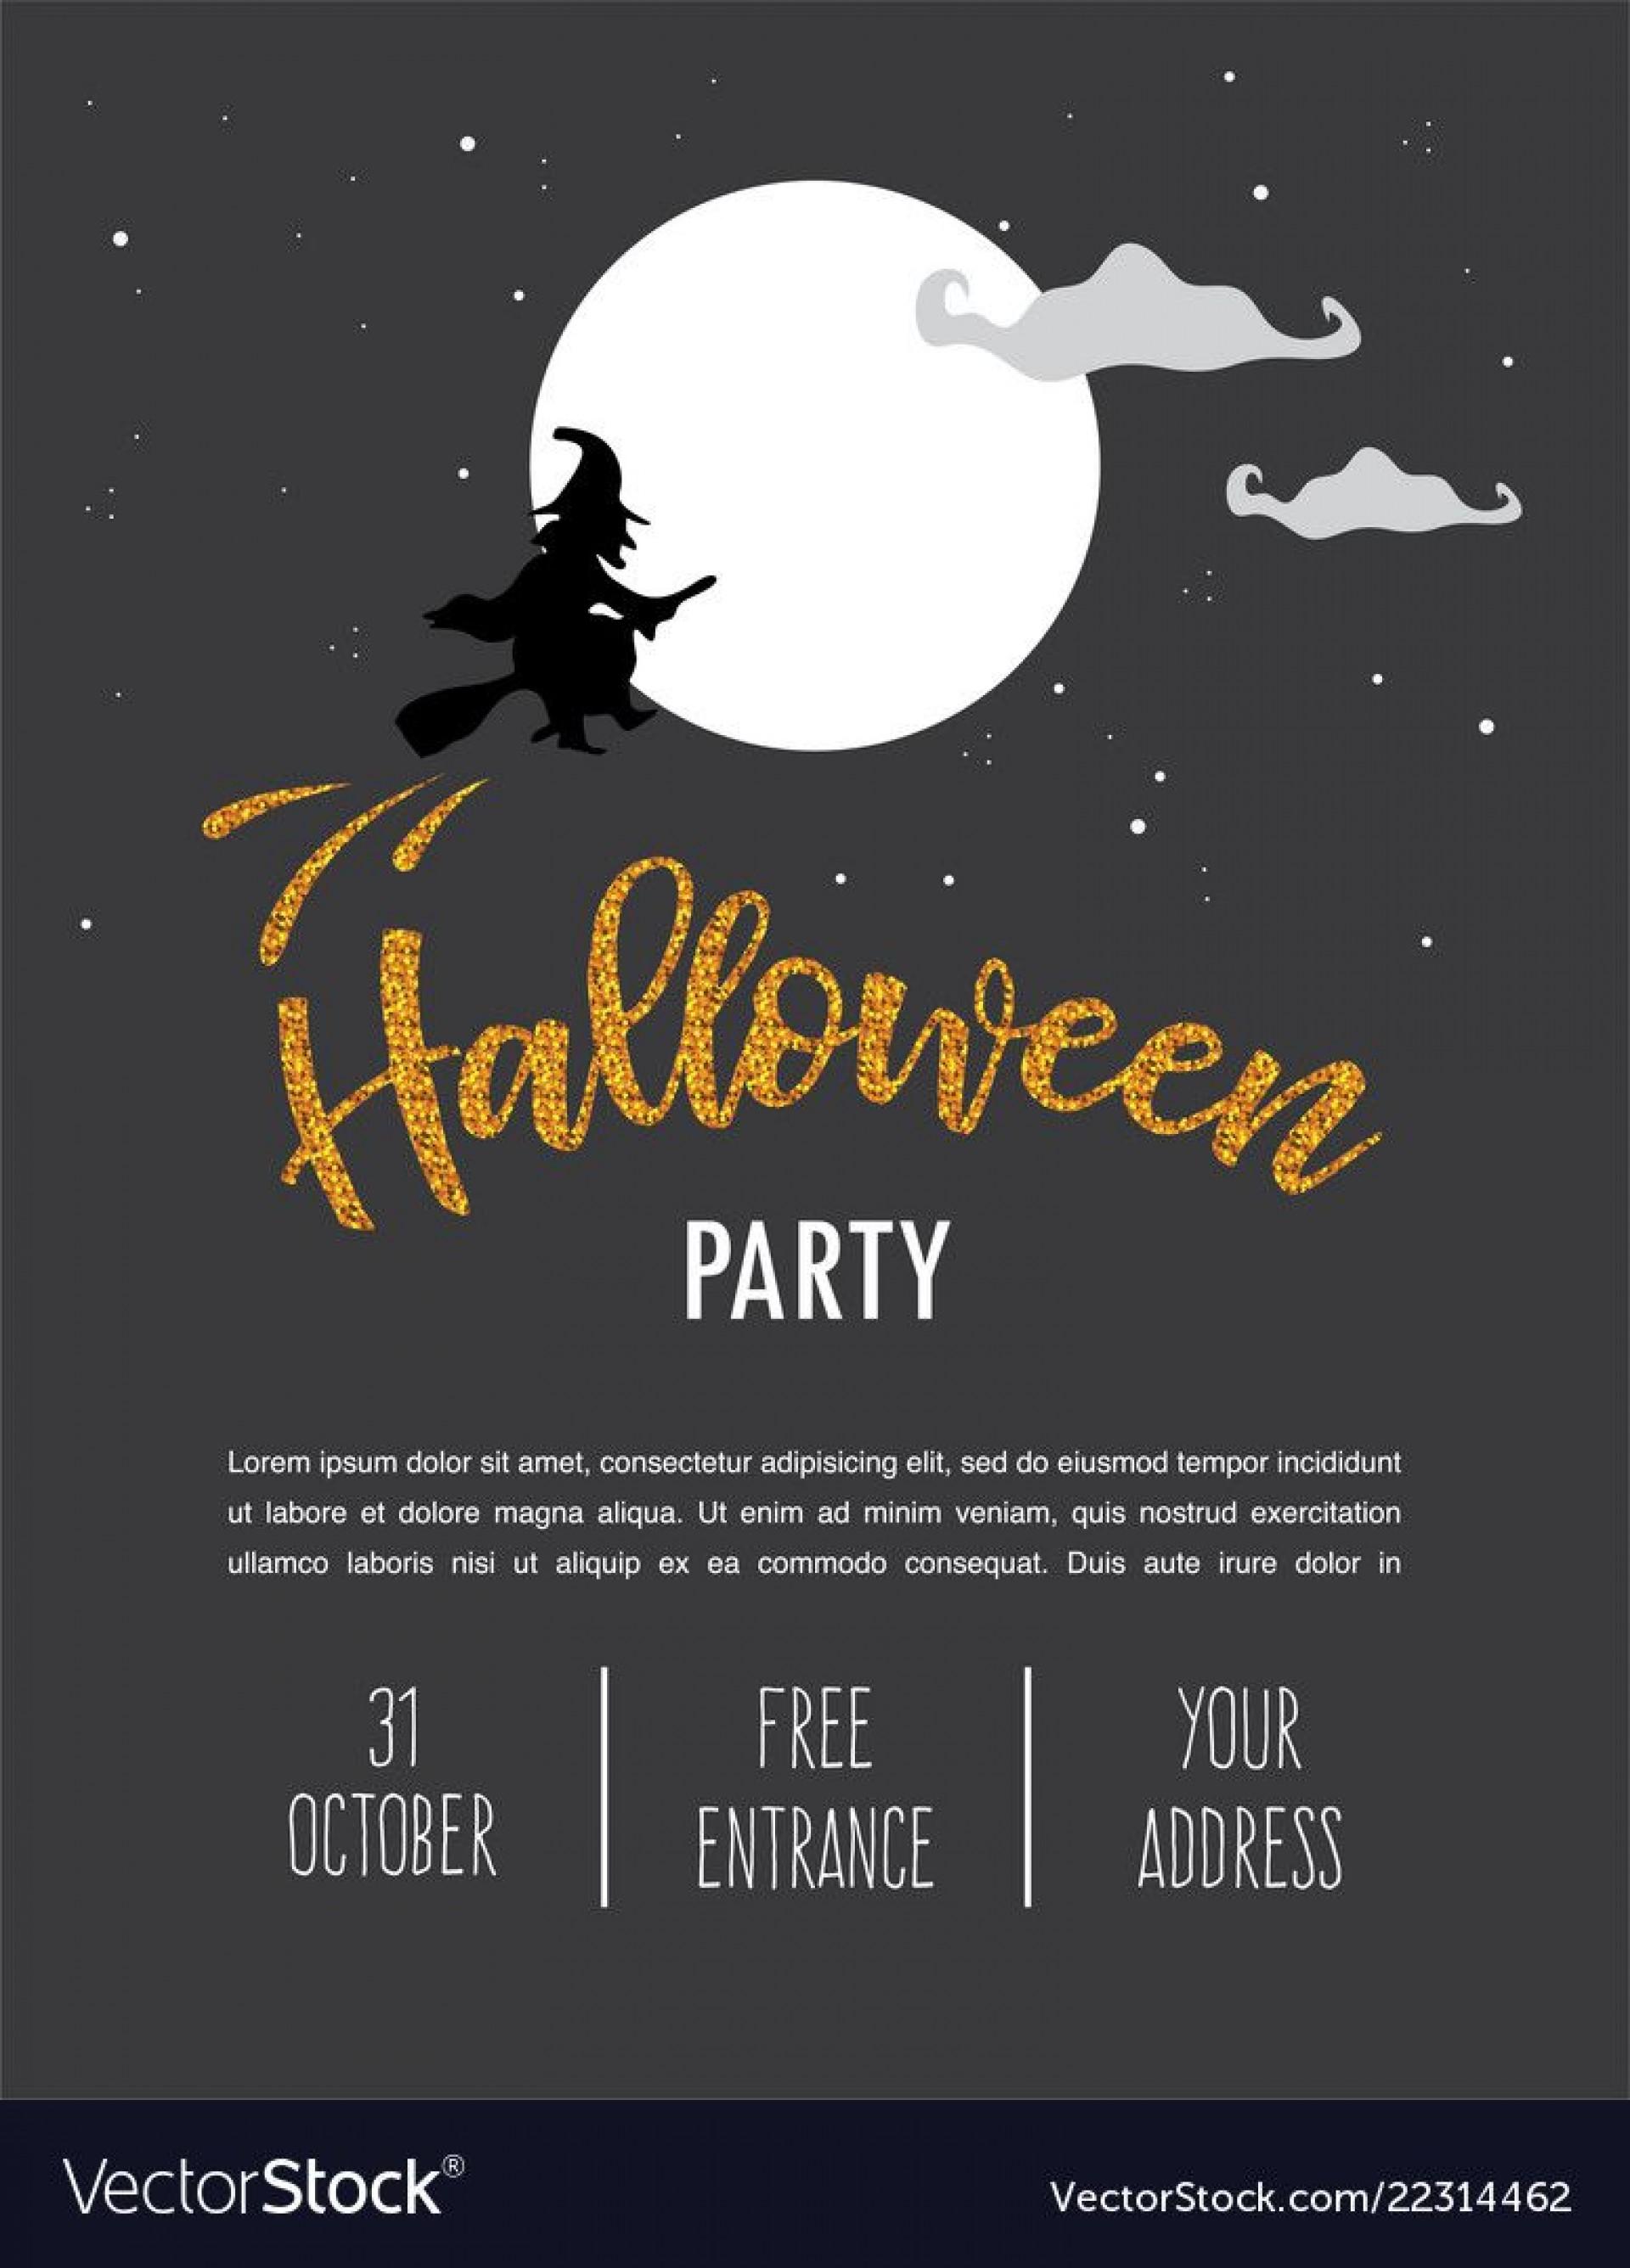 017 Shocking Free Halloween Invitation Template Sample  Templates Microsoft Word Wedding Printable Party1920